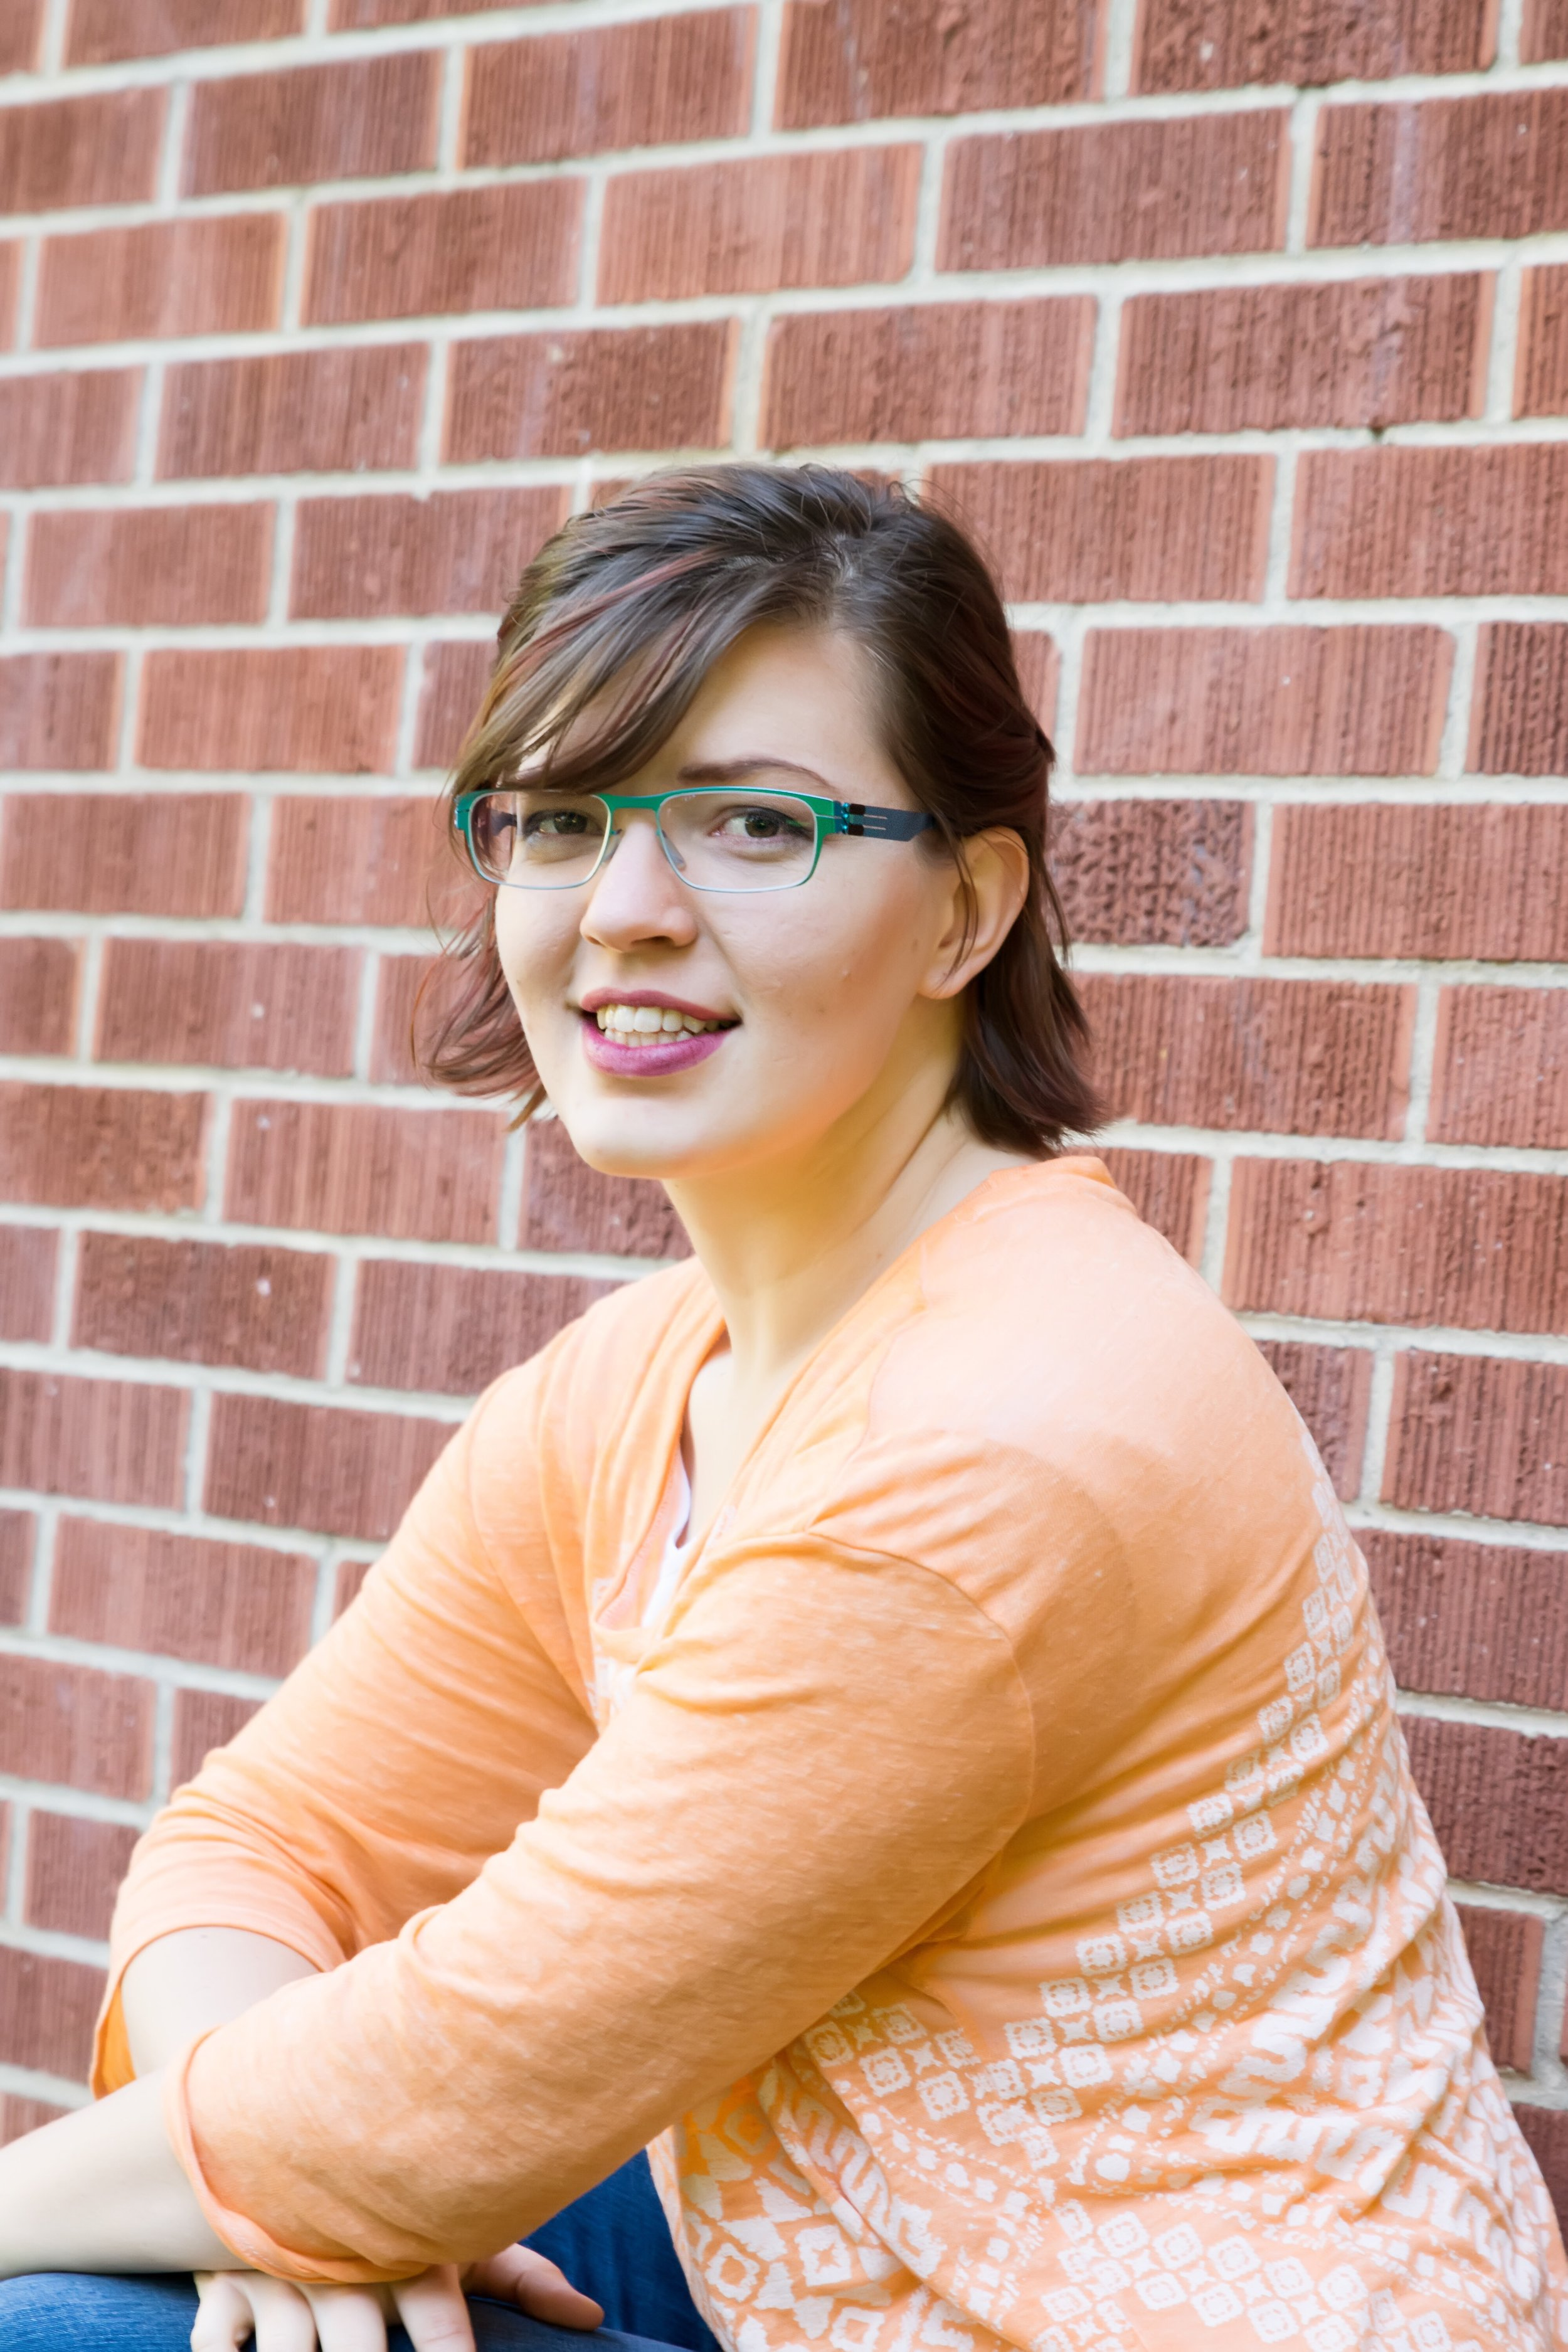 Winner Sarah Mottaghinejad is an artist living in West Seattle